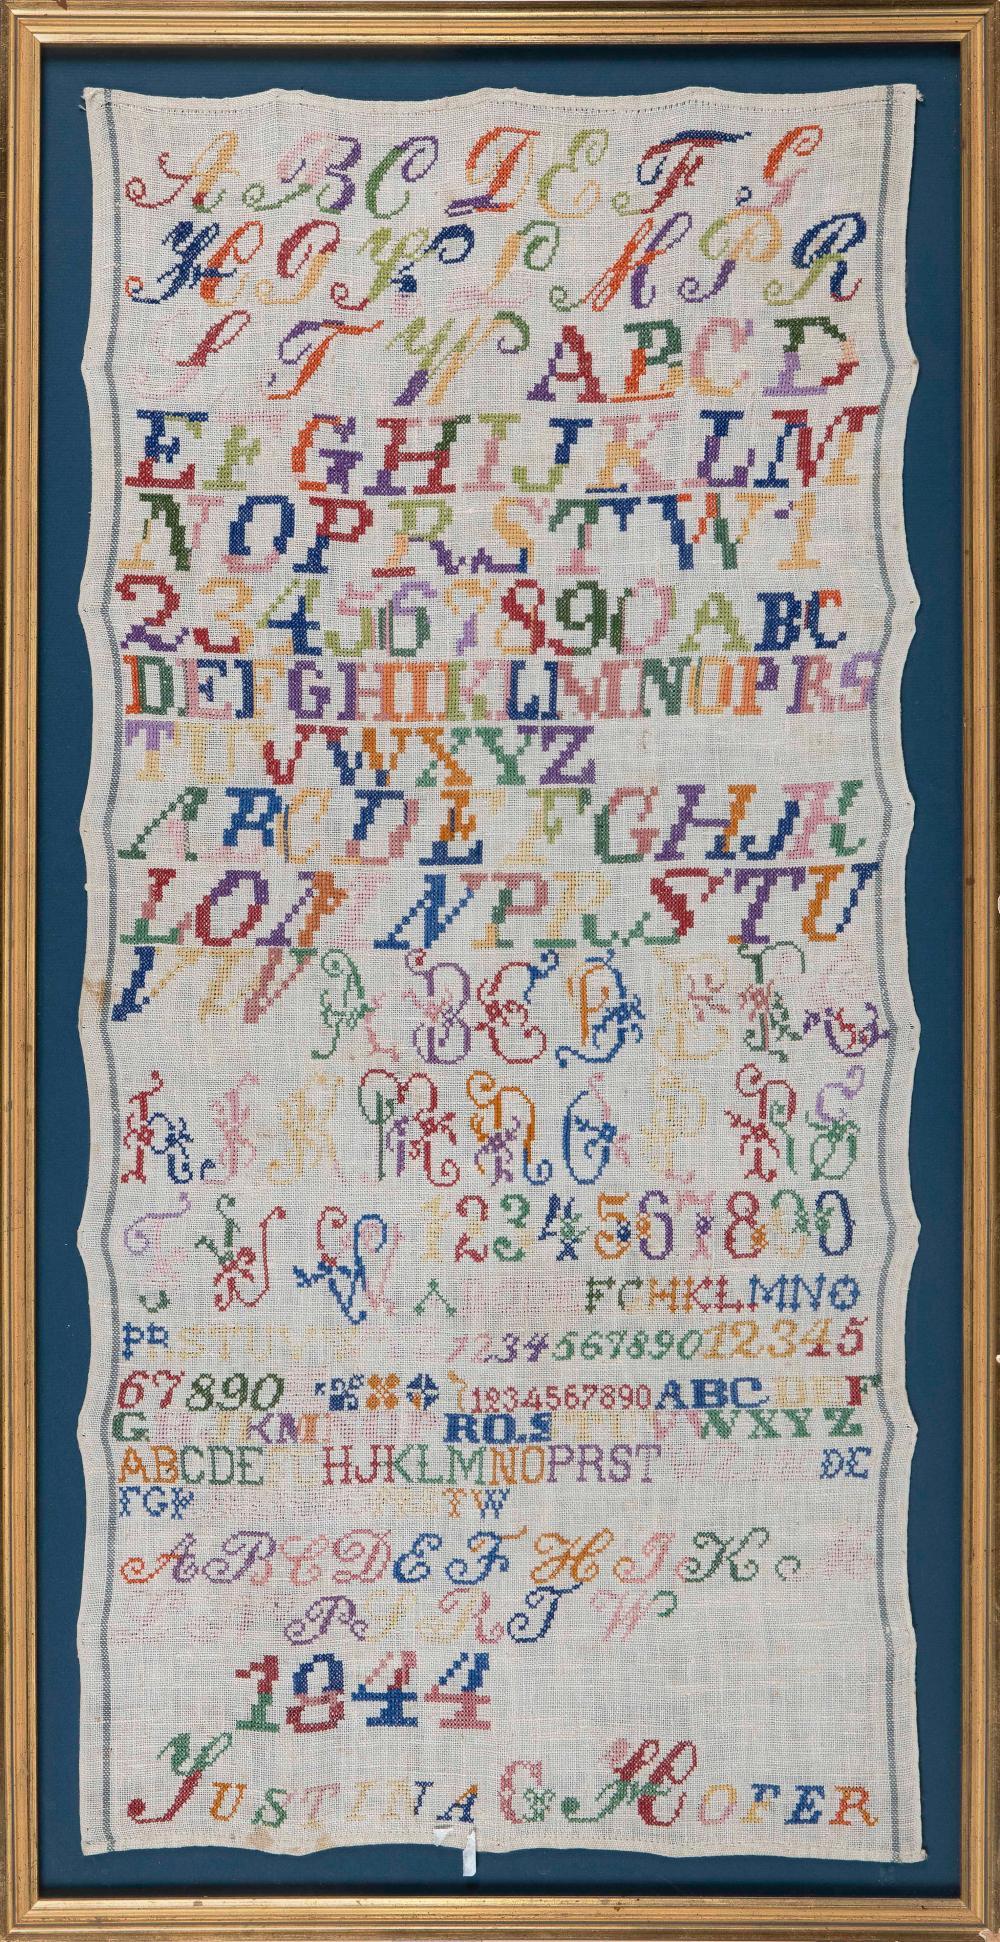 "ENGLISH NEEDLEWORK SAMPLER Dated 1844 37"" x 17"". Framed 41"" x 21""."